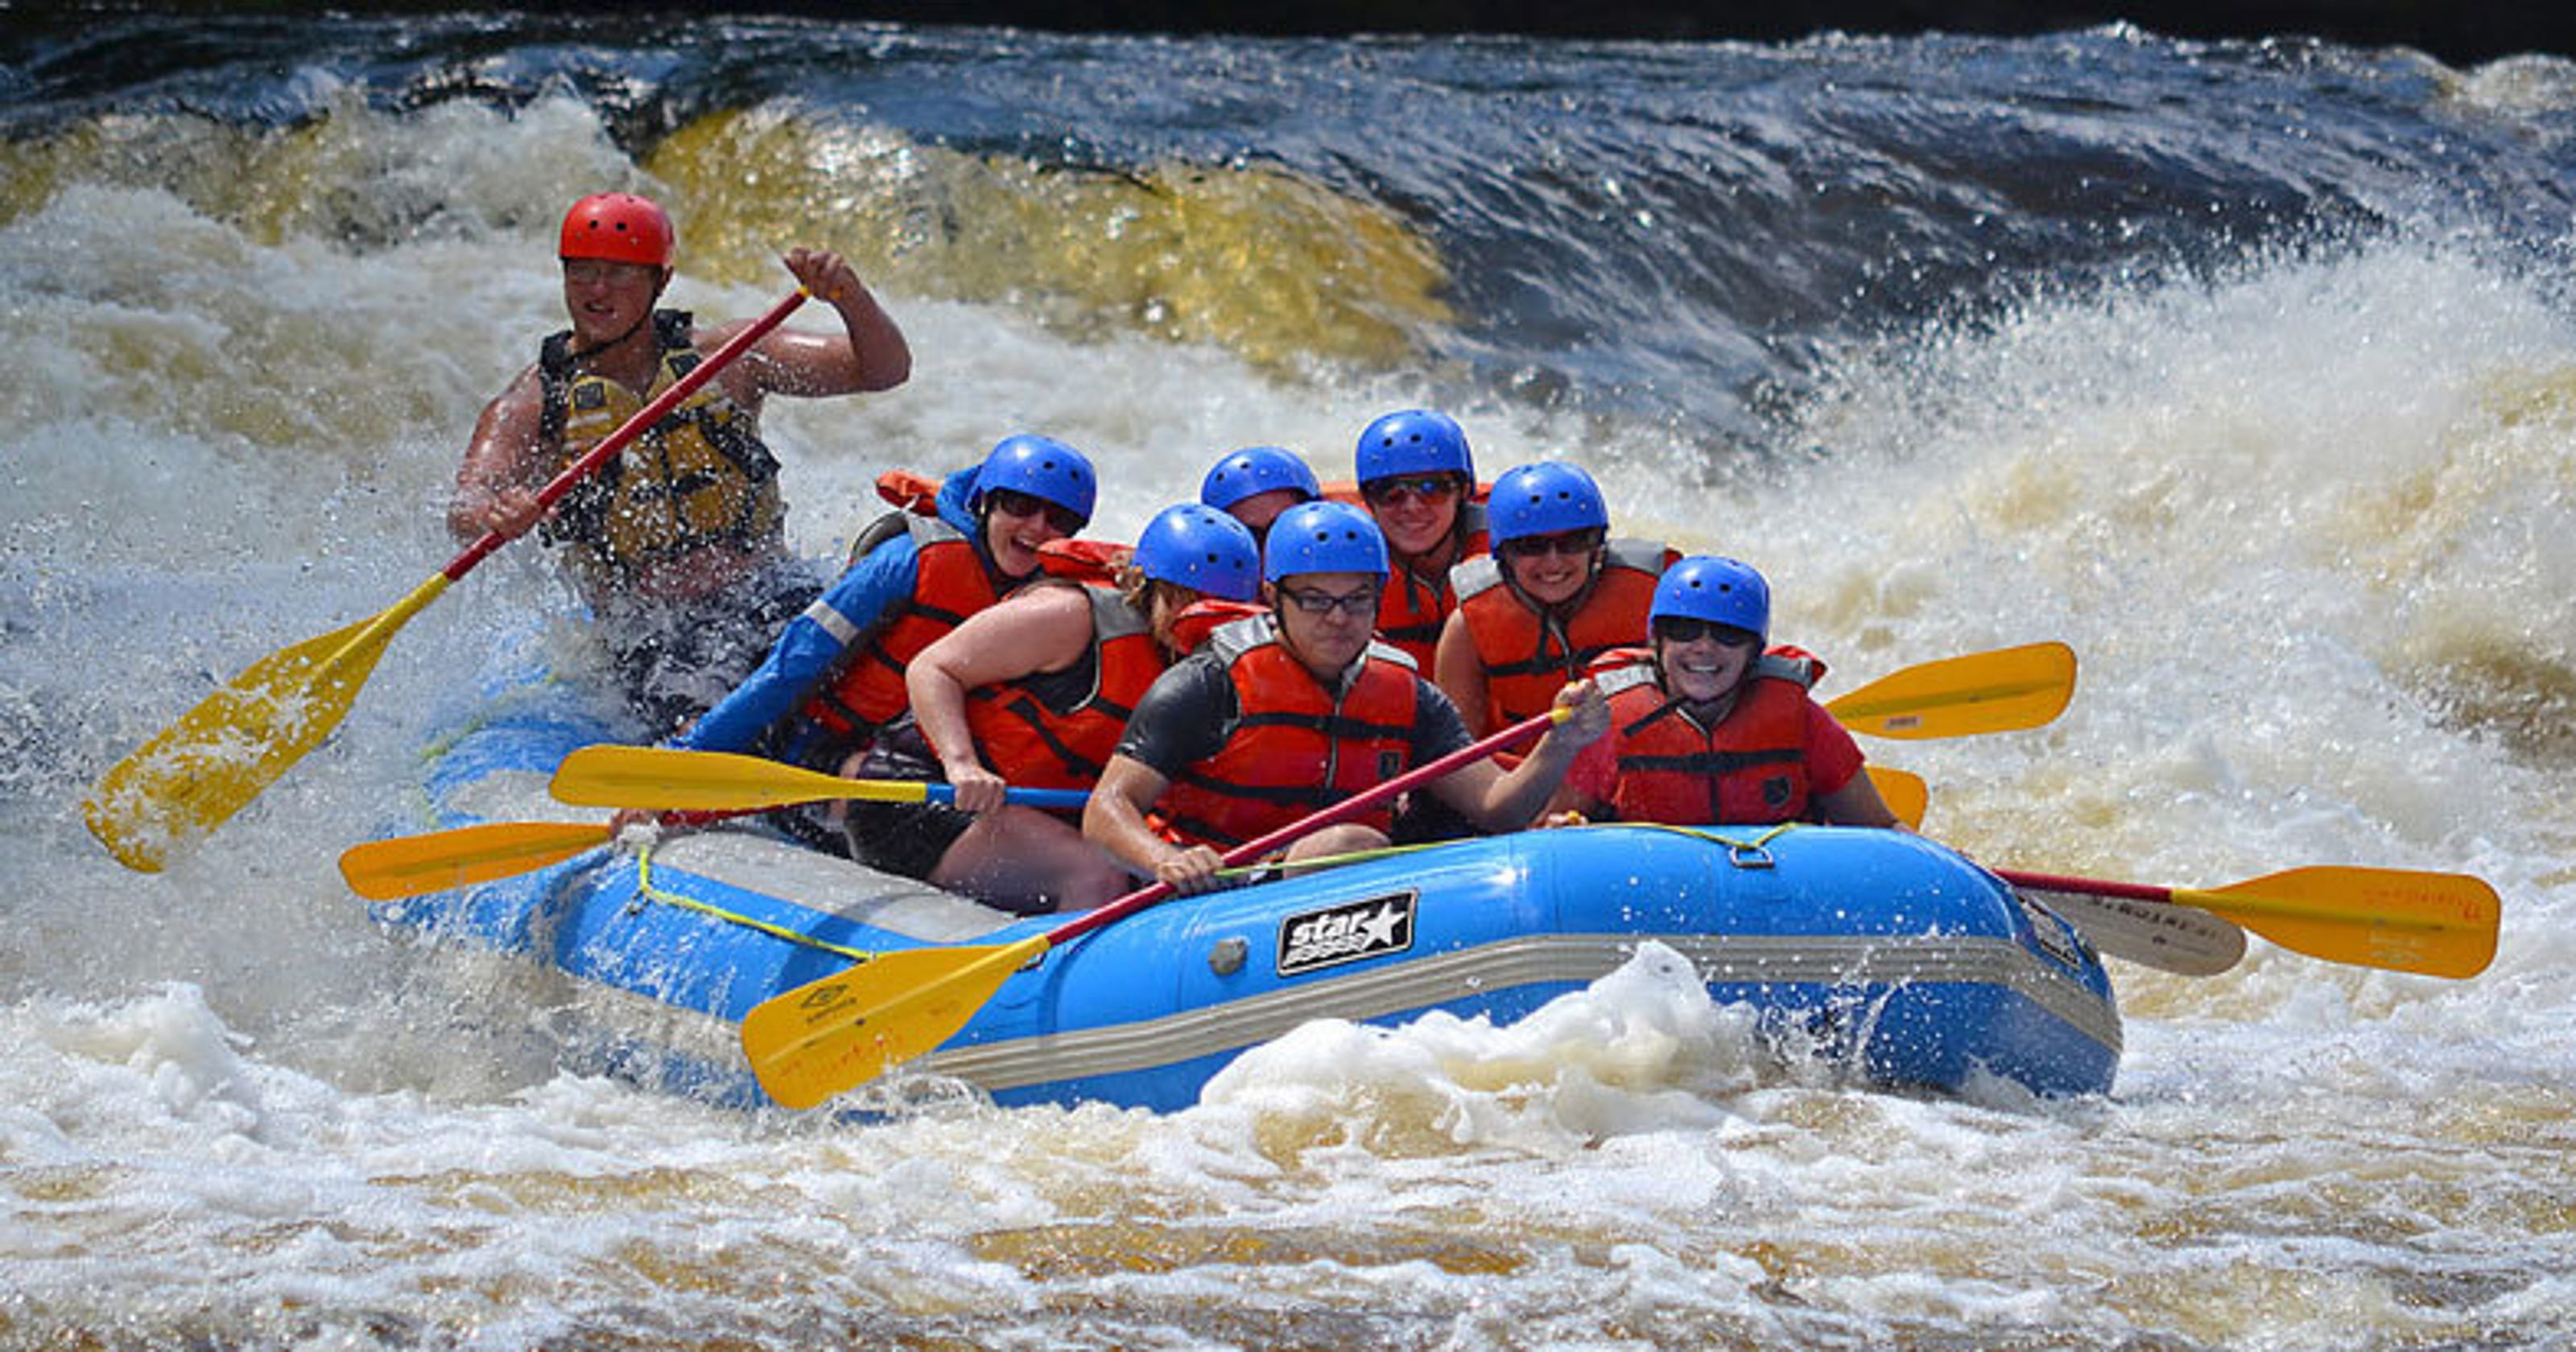 Ultimate Michigan summer sports bucket list: 50 activities